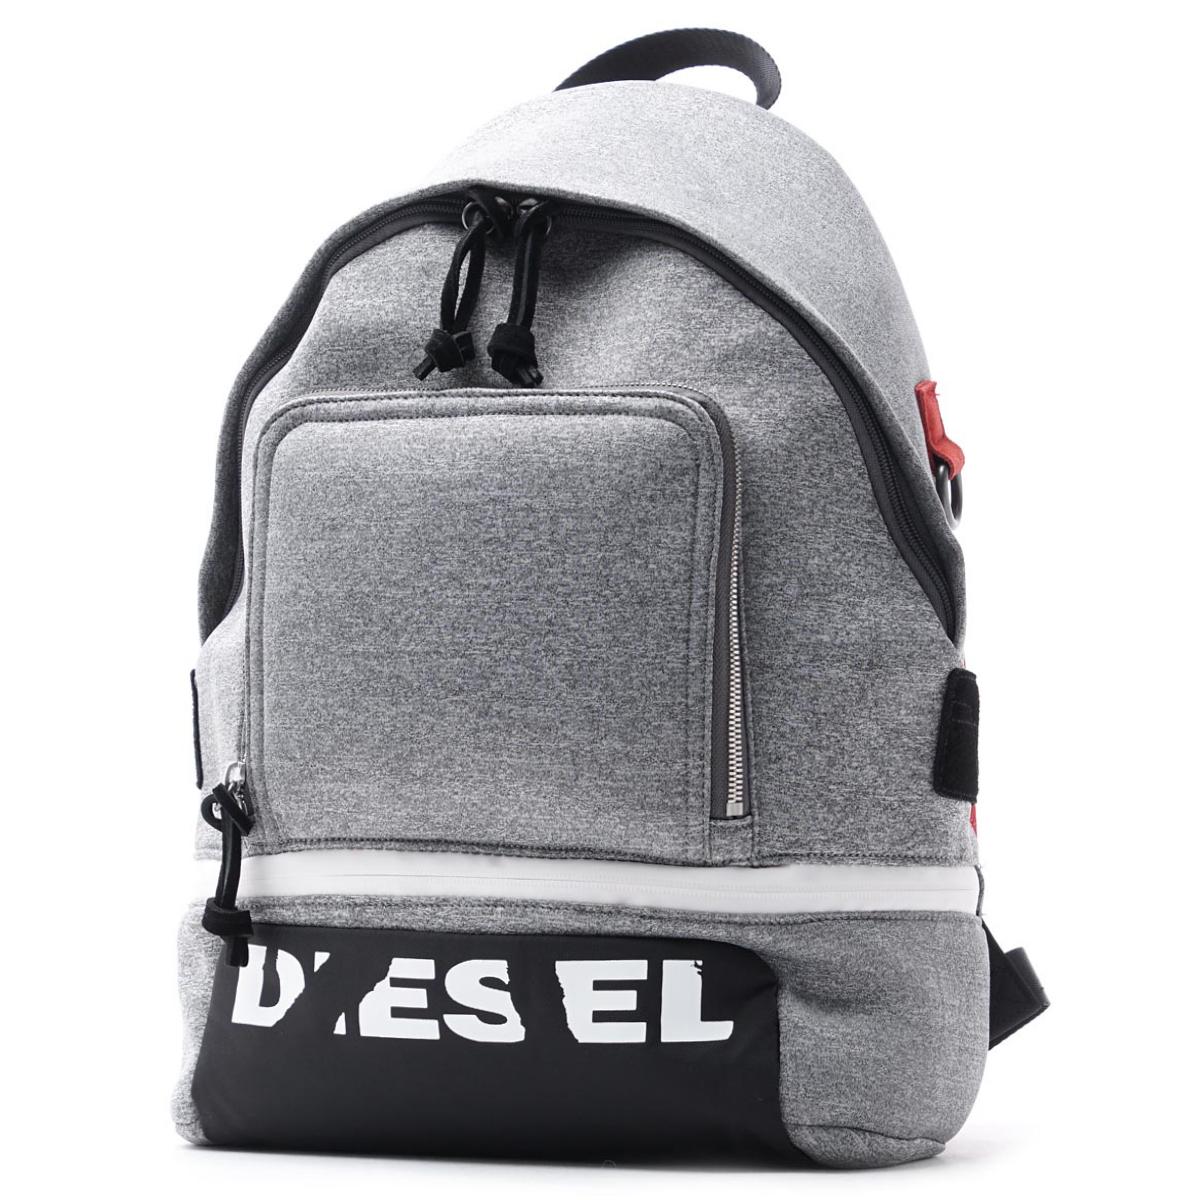 3a31ccee88b63b リュック・バックパック メンズ ブルー/ H4933 X03192 PS946/ 鞄 ブラック ユニセックス バッグ DIESEL ディーゼル